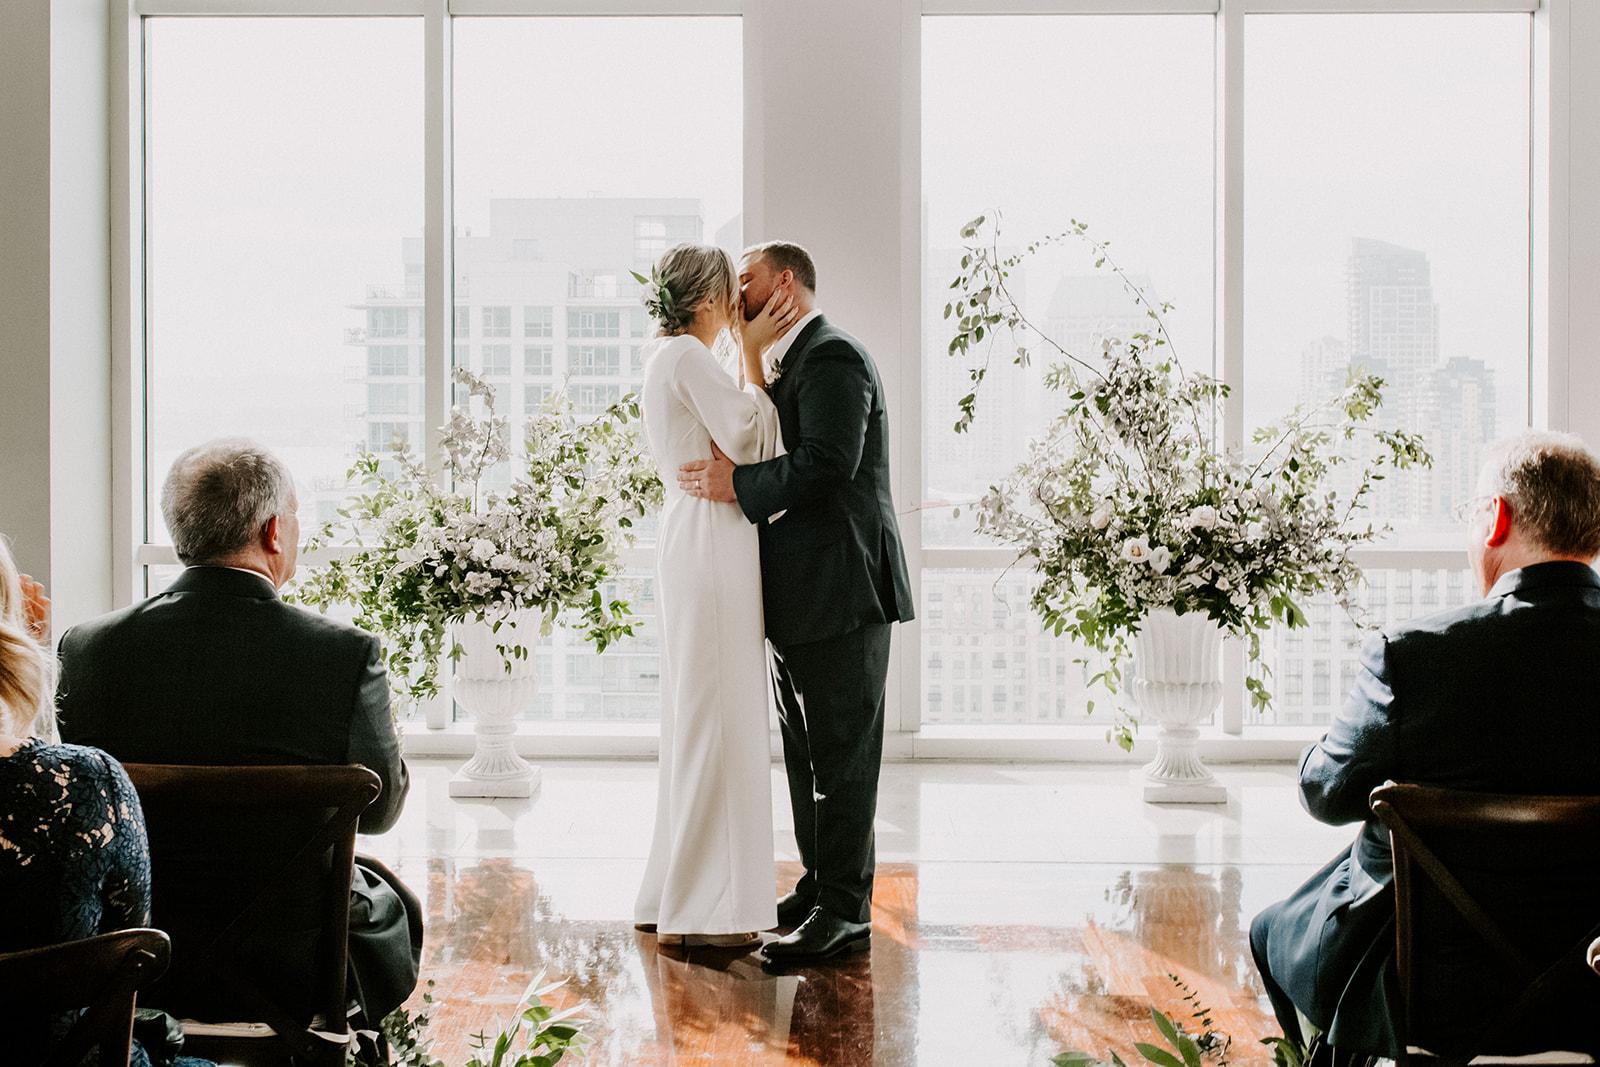 Mckenzie + Trevor The Ultimate Skybox Downtown San Diego Wedding Ellie Cole Photographer-457-2.jpg